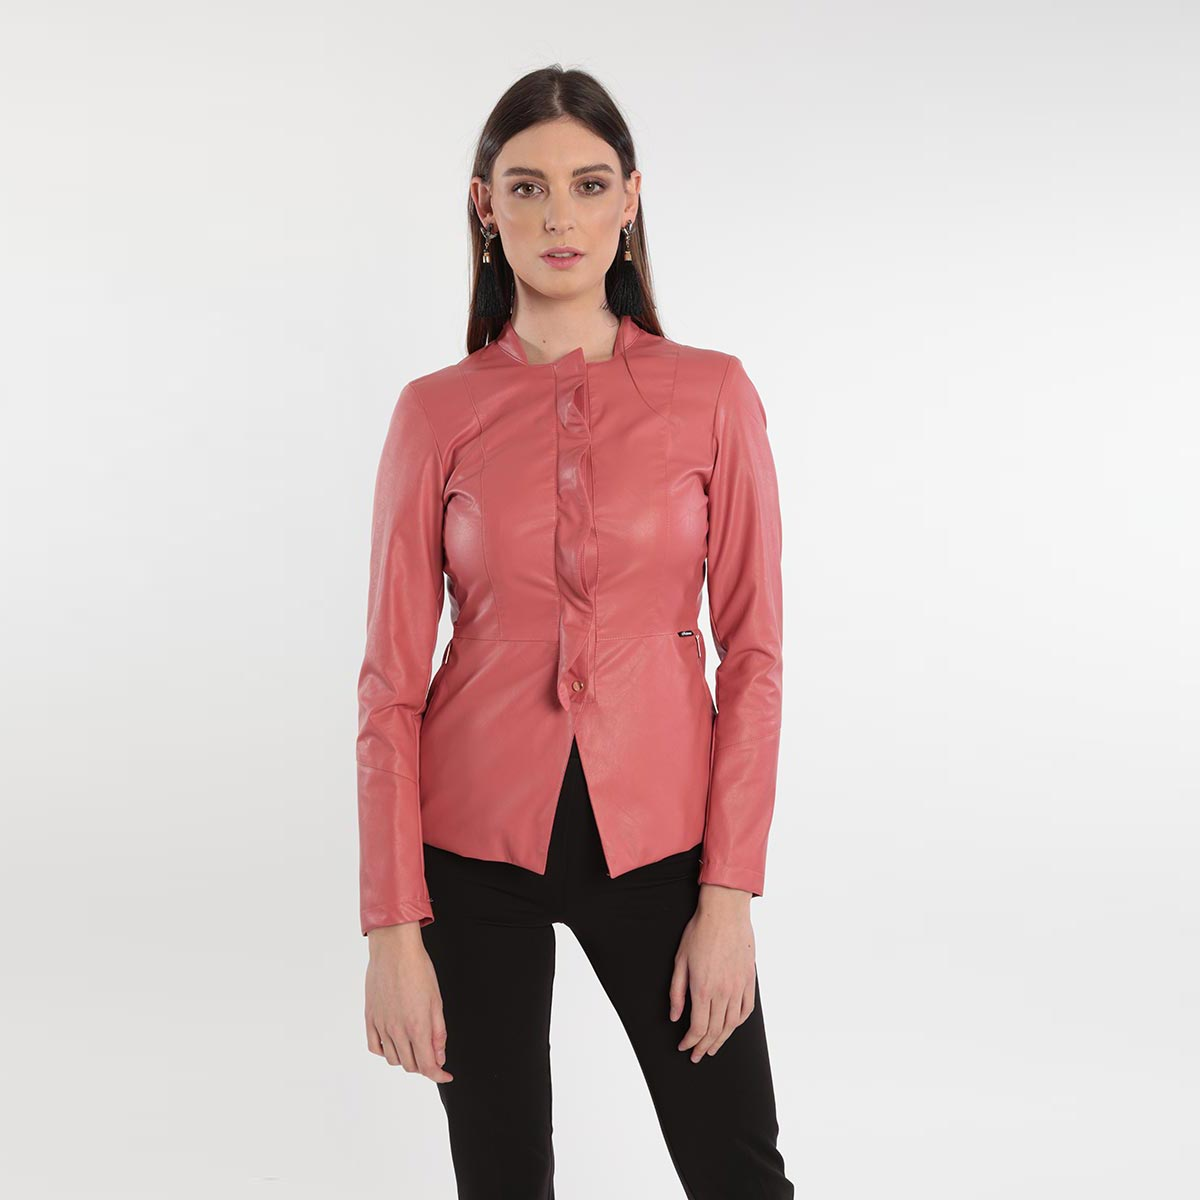 Giacca in ecopelle sfiancata con rouges donne curvy primavera 2020 Meteore Fashion